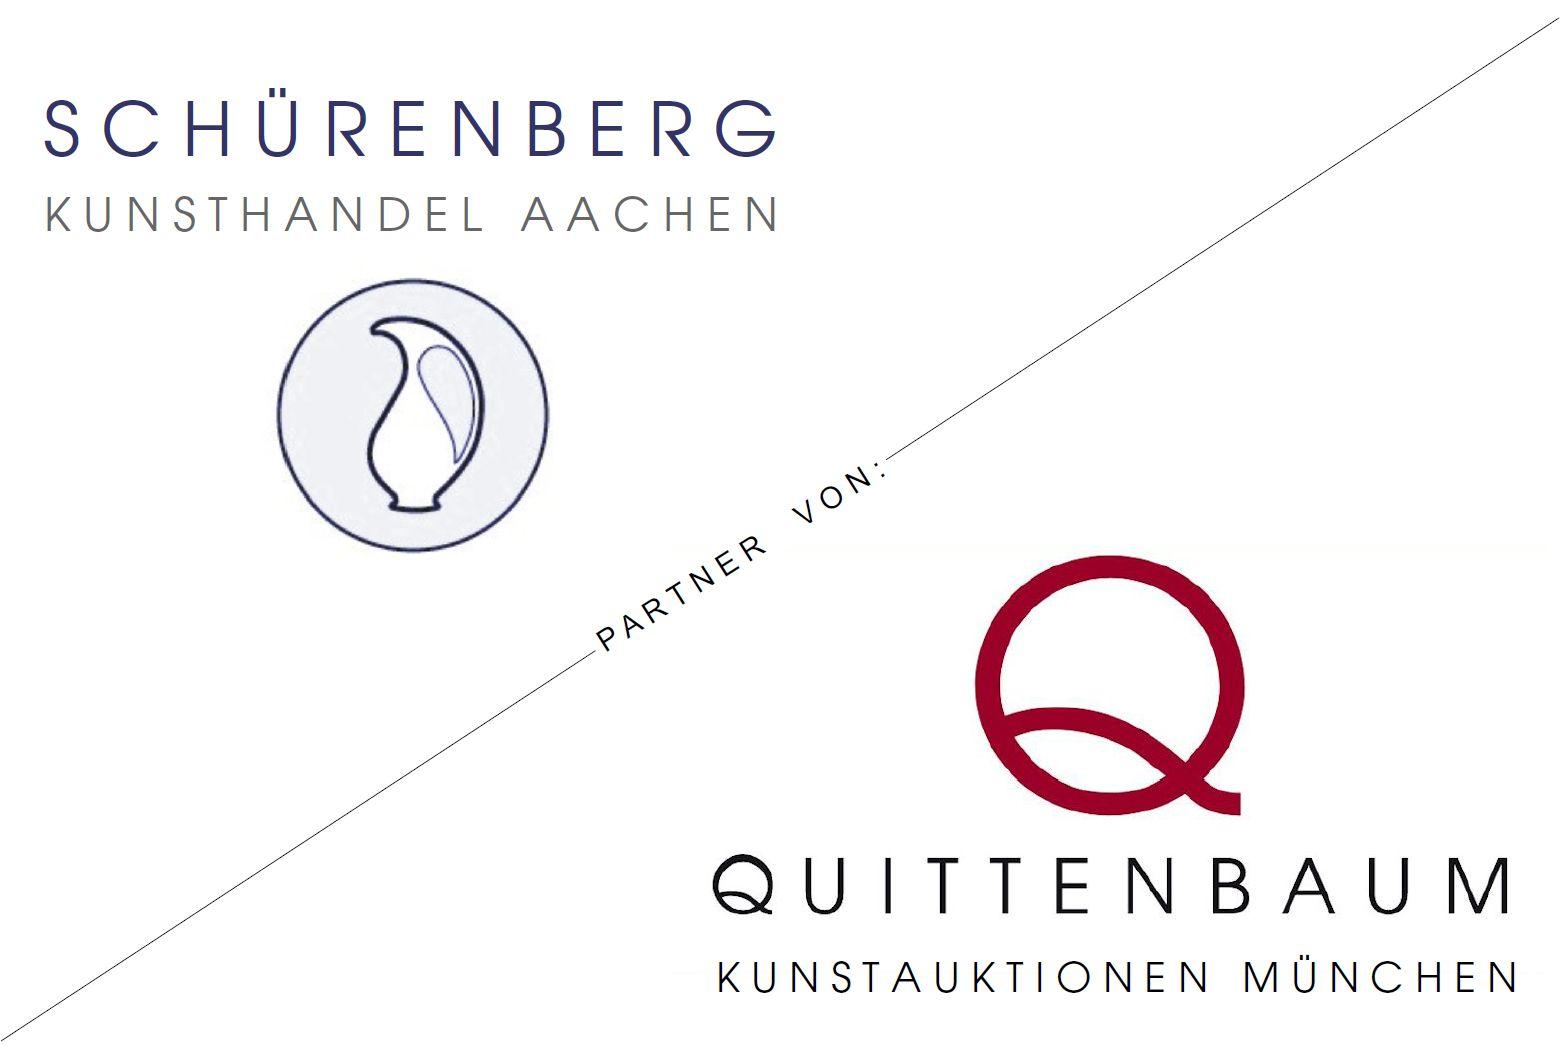 Schürenberg Quittenbaum